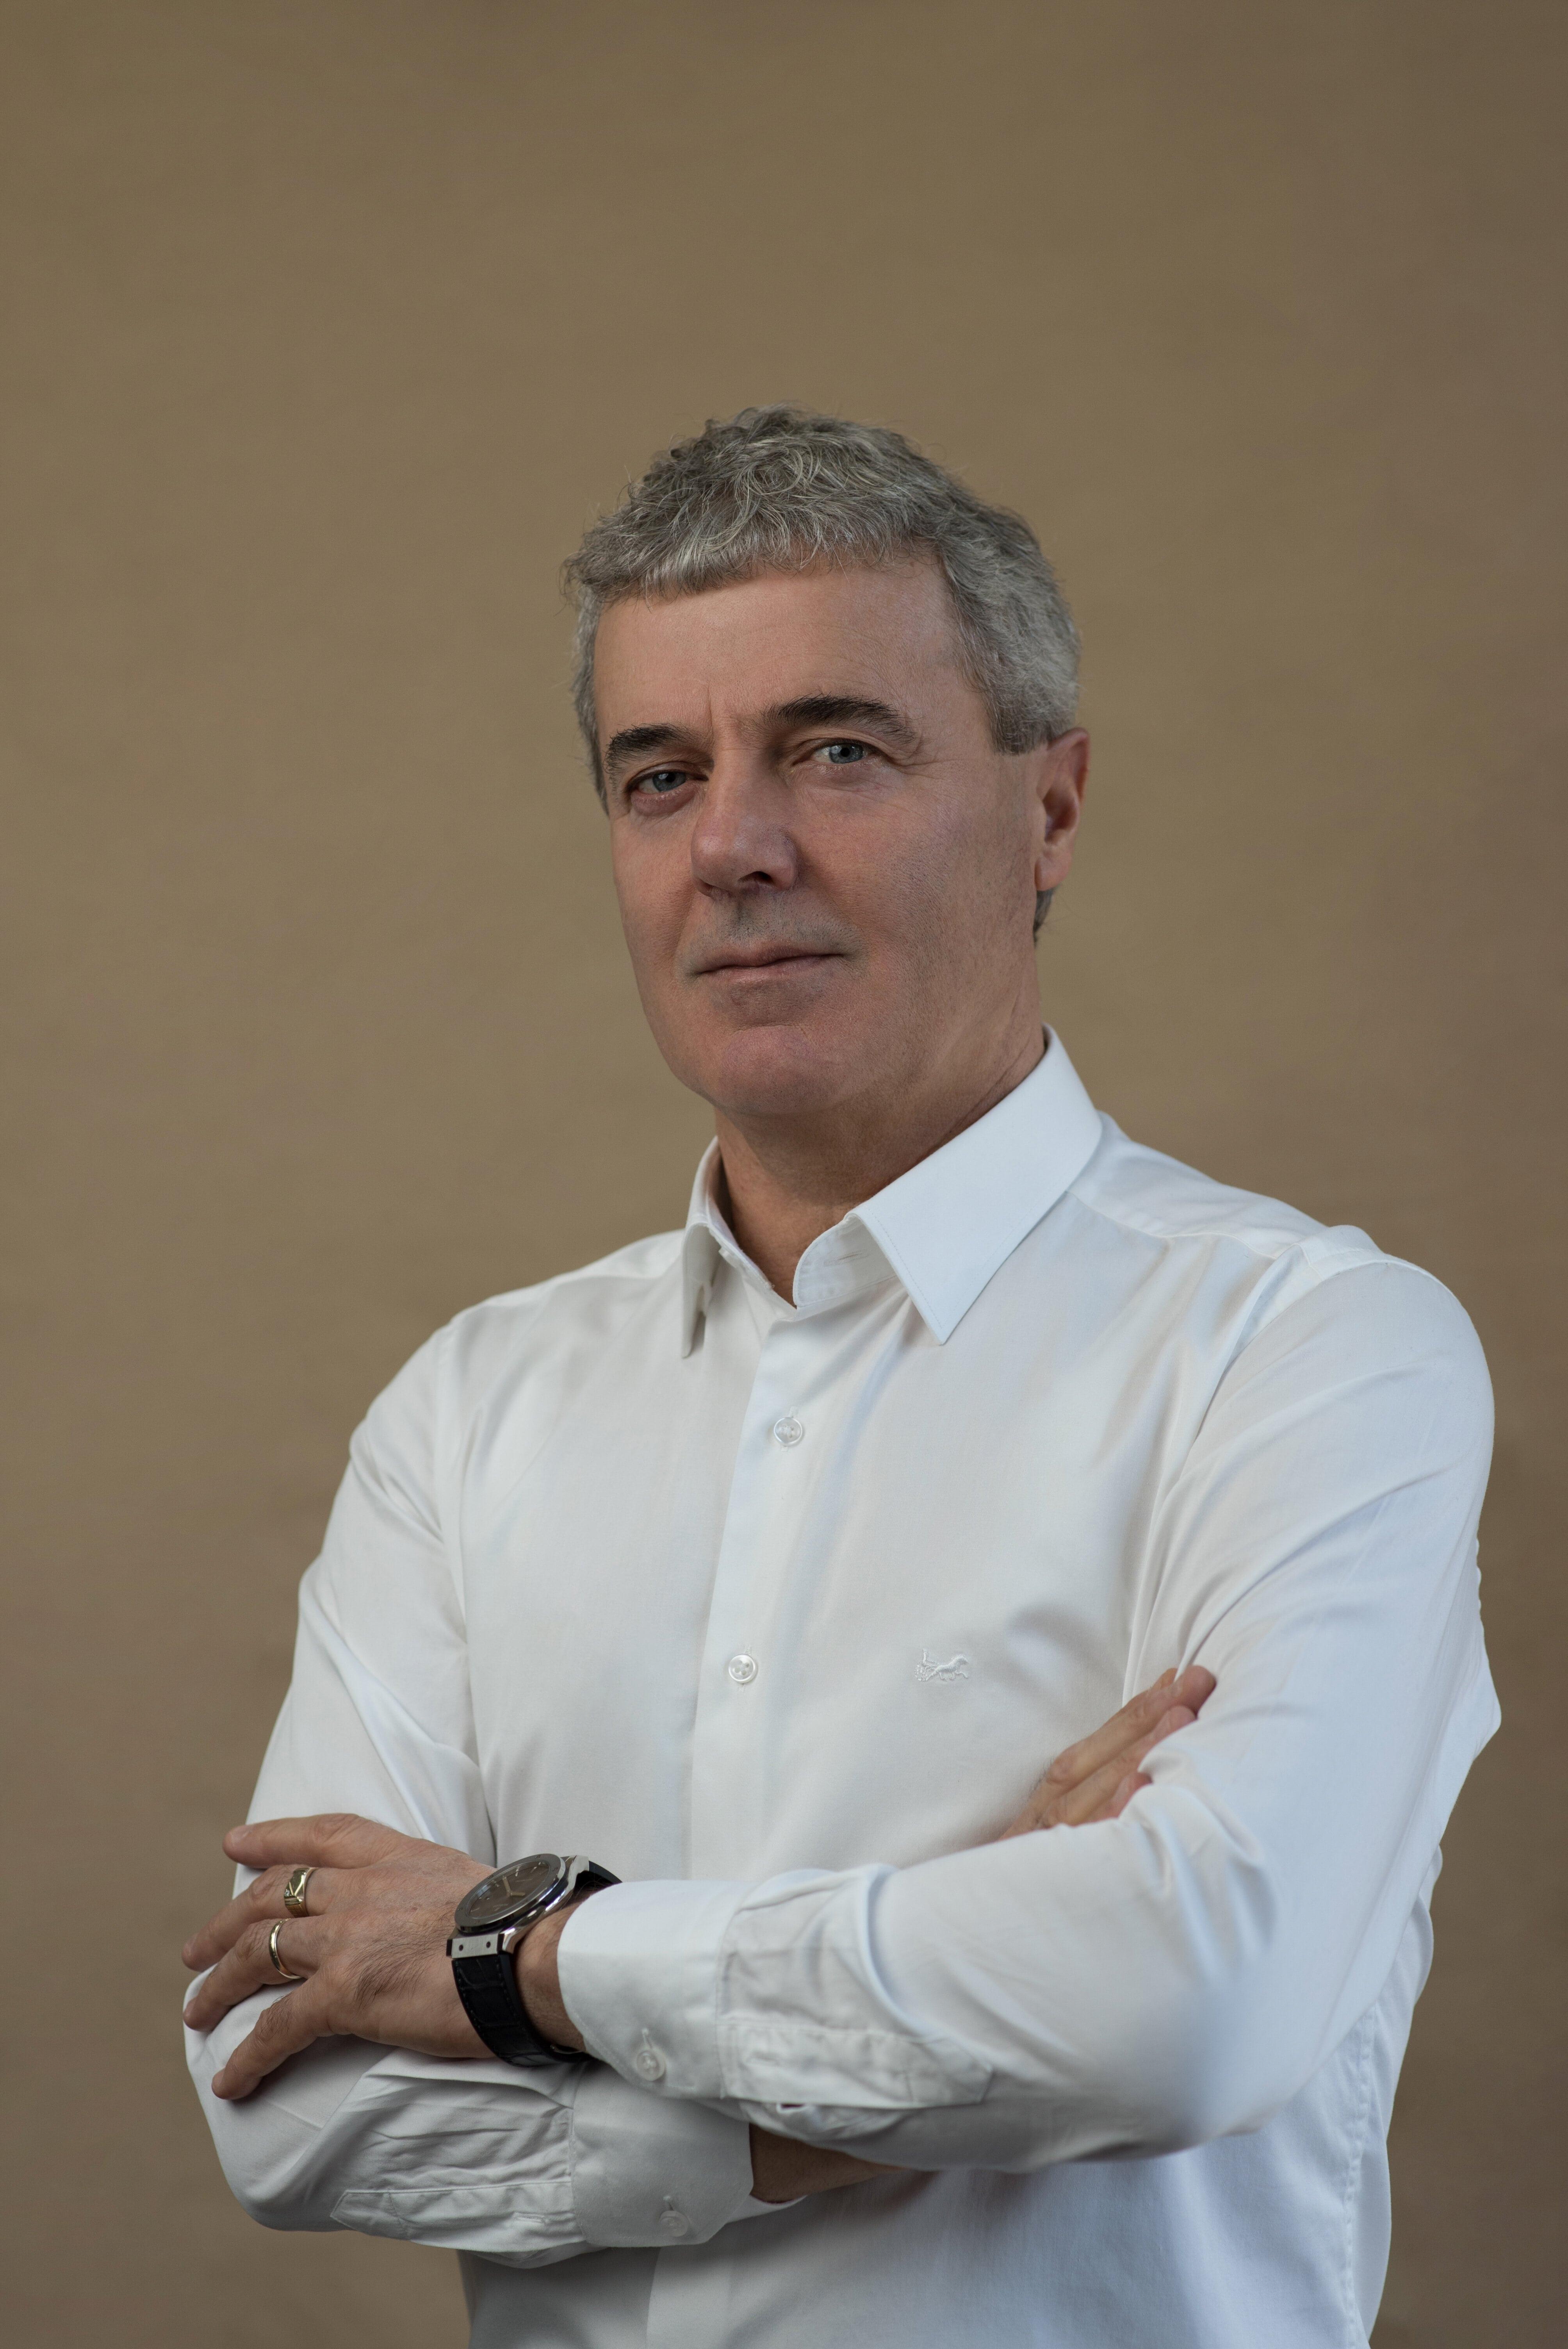 Eduard Rryta